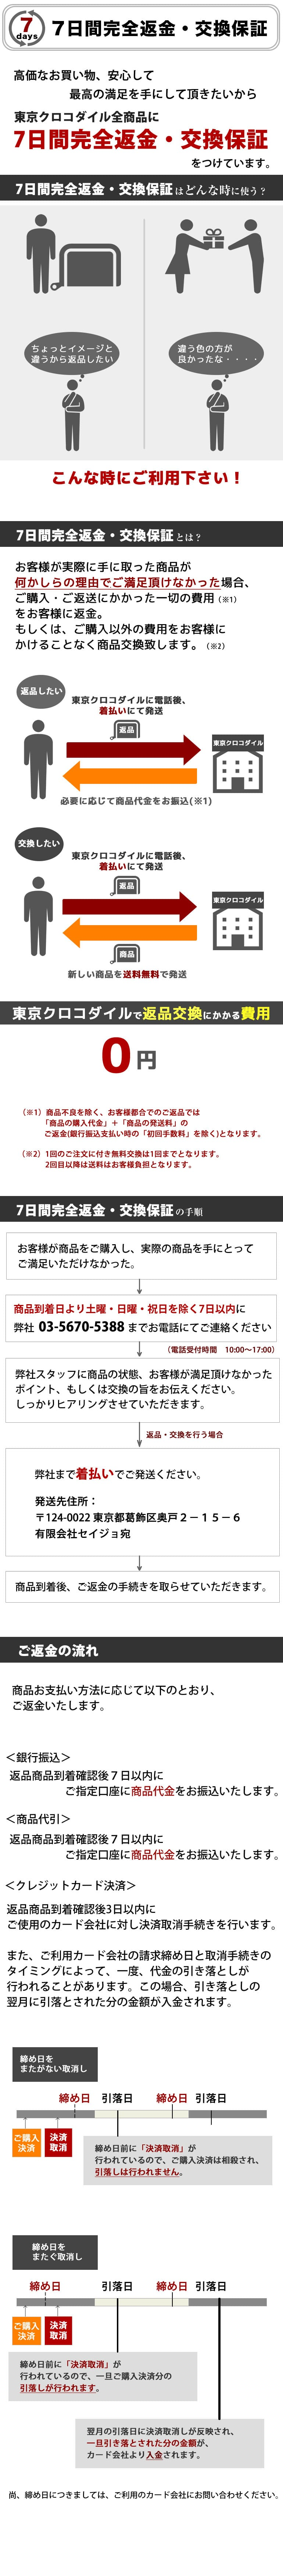 c79da634d106 東京クロコダイルだけの 7日間完全返金交換保証. TOPに戻る; 素材から選ぶ; シャイニングクロコダイル; マットクロコダイル; エレファント ...